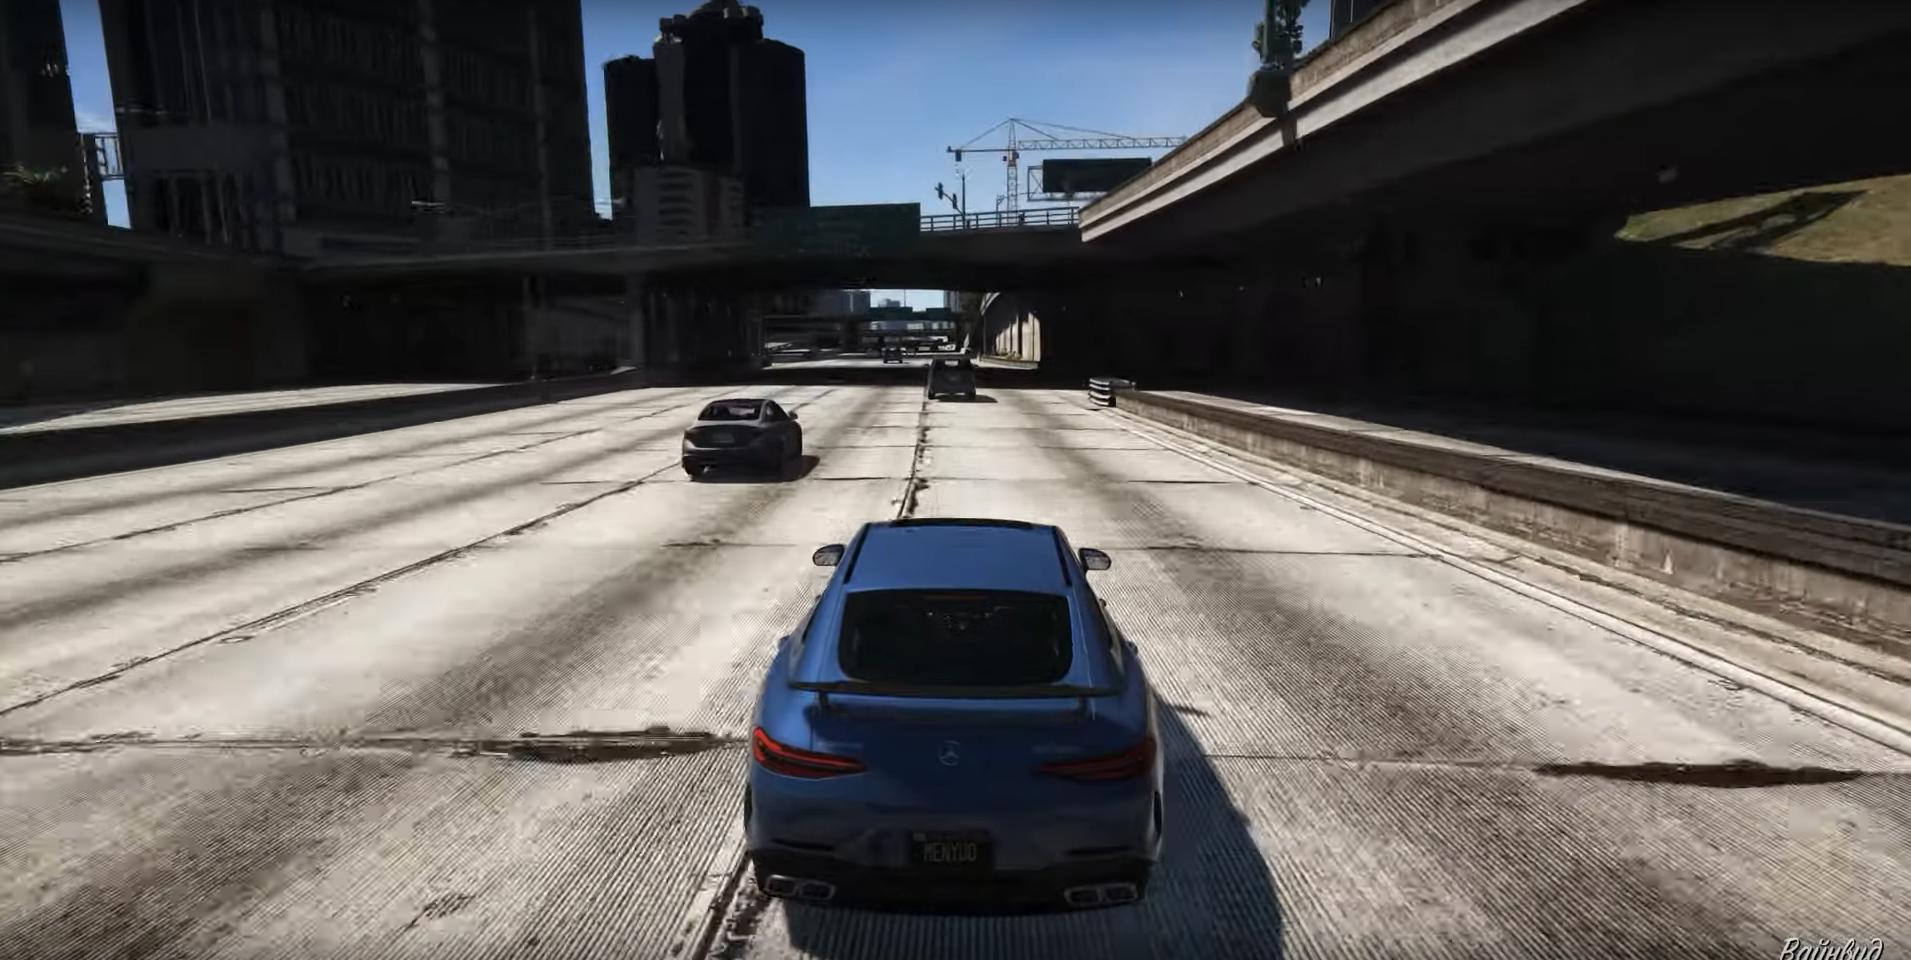 Images - GTA V Mega Car Addon 2019 mod for Grand Theft Auto